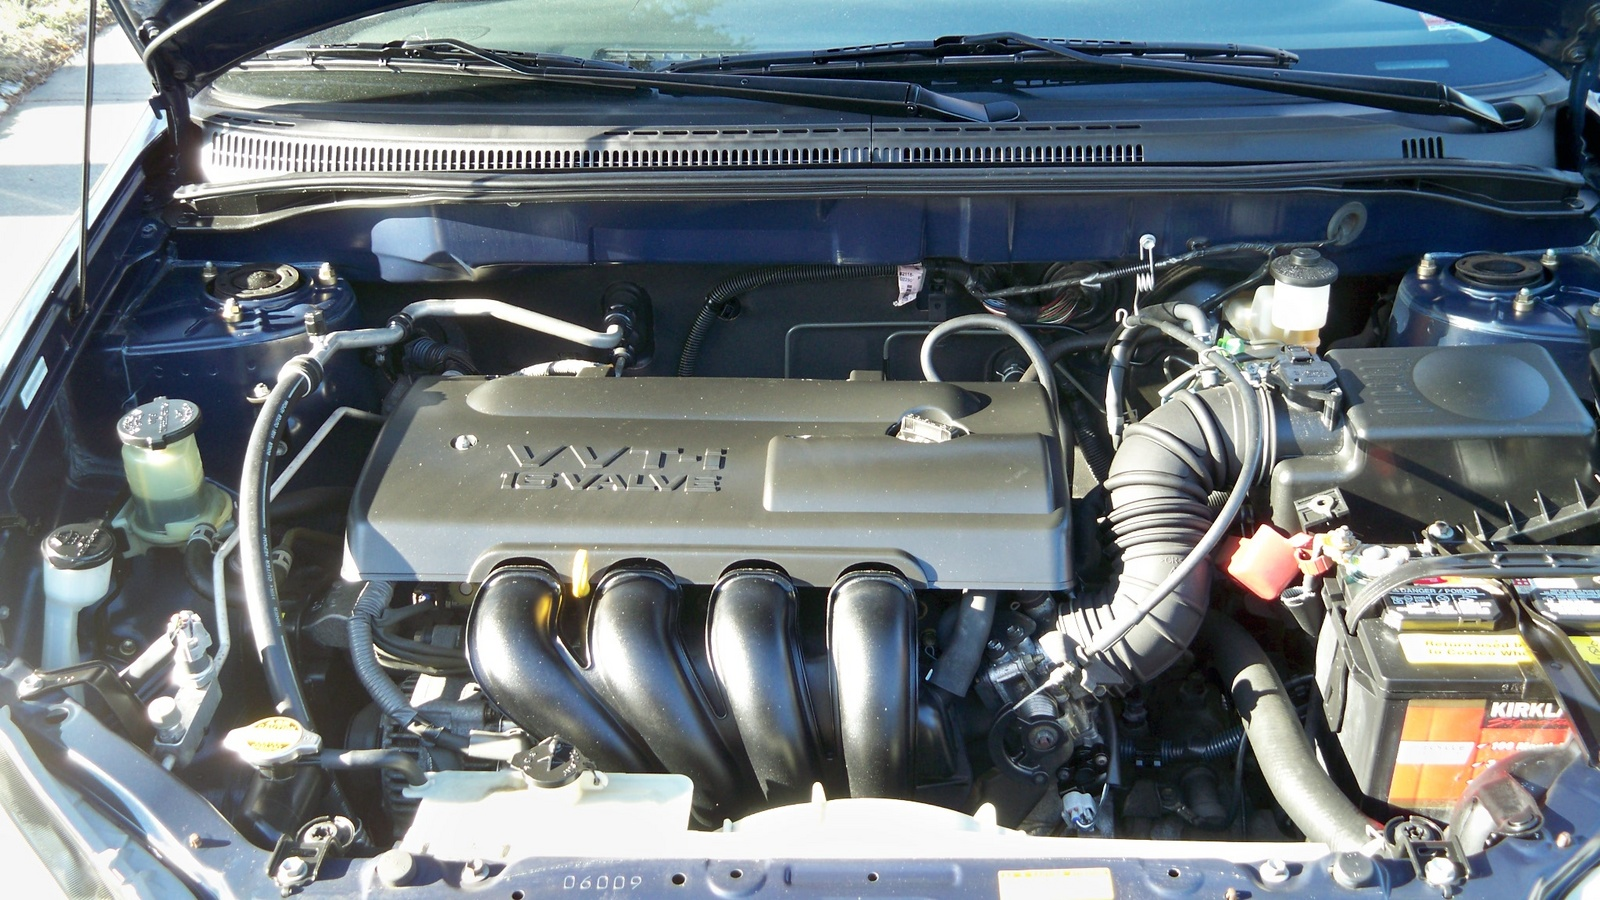 Toyota Corolla S Pic on 1985 Toyota Tercel Engine